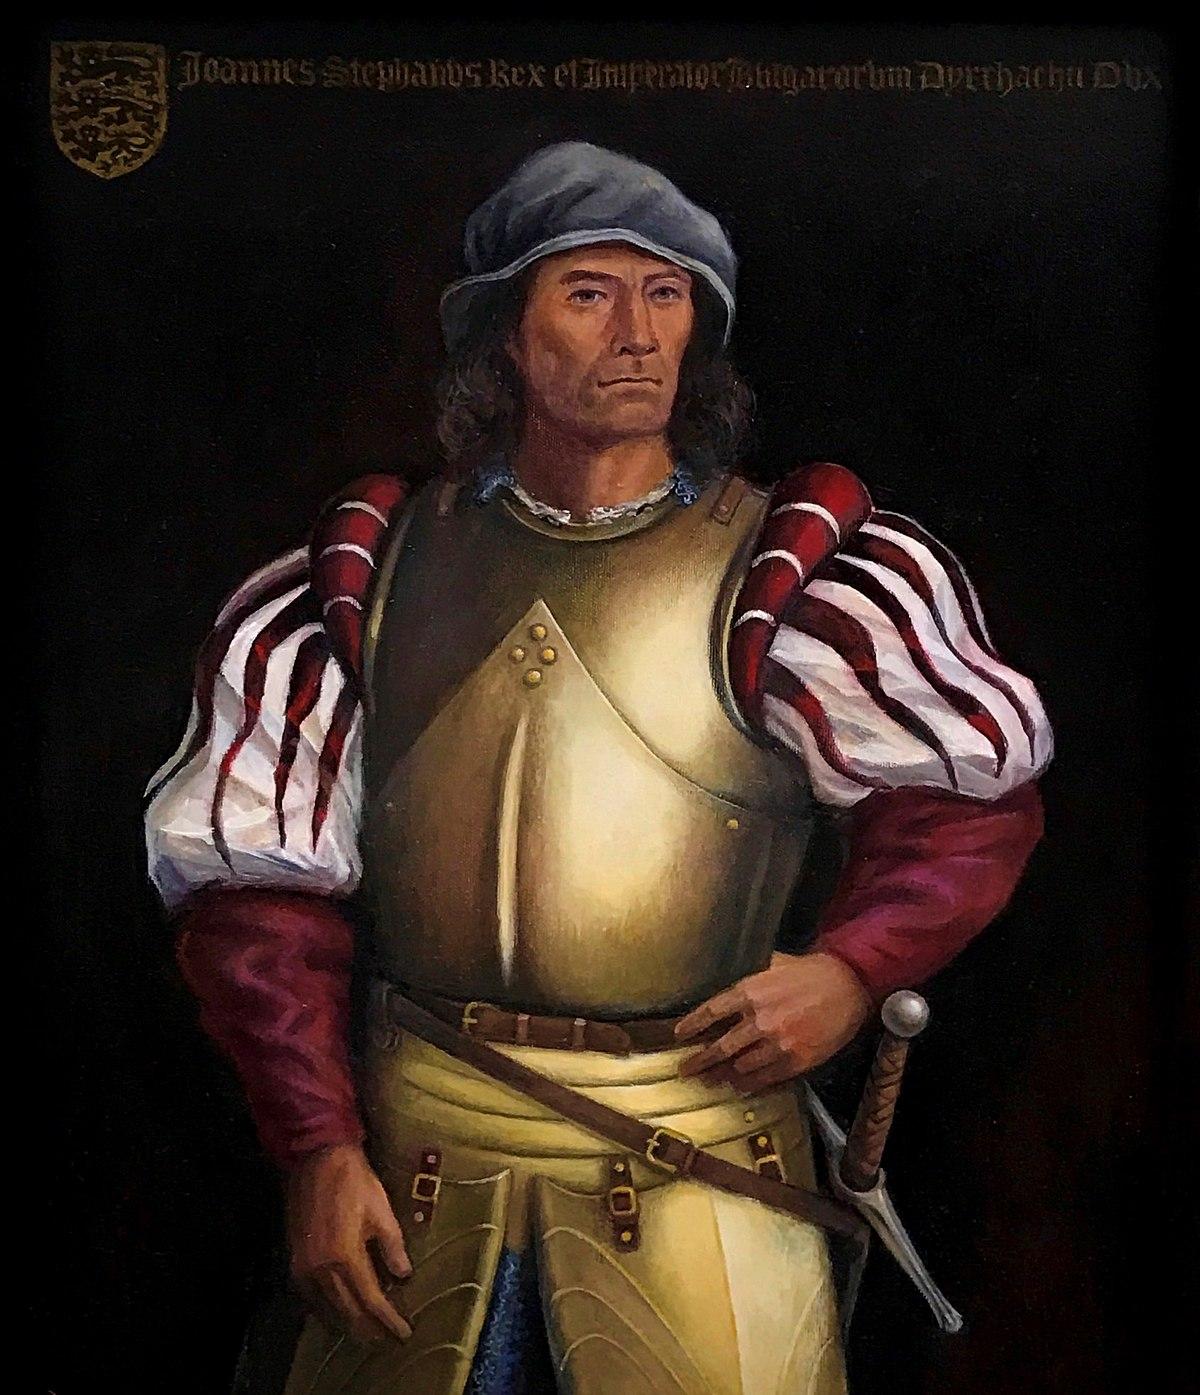 1200px-King_John_Stephen_of_Bulgaria_19th_Century